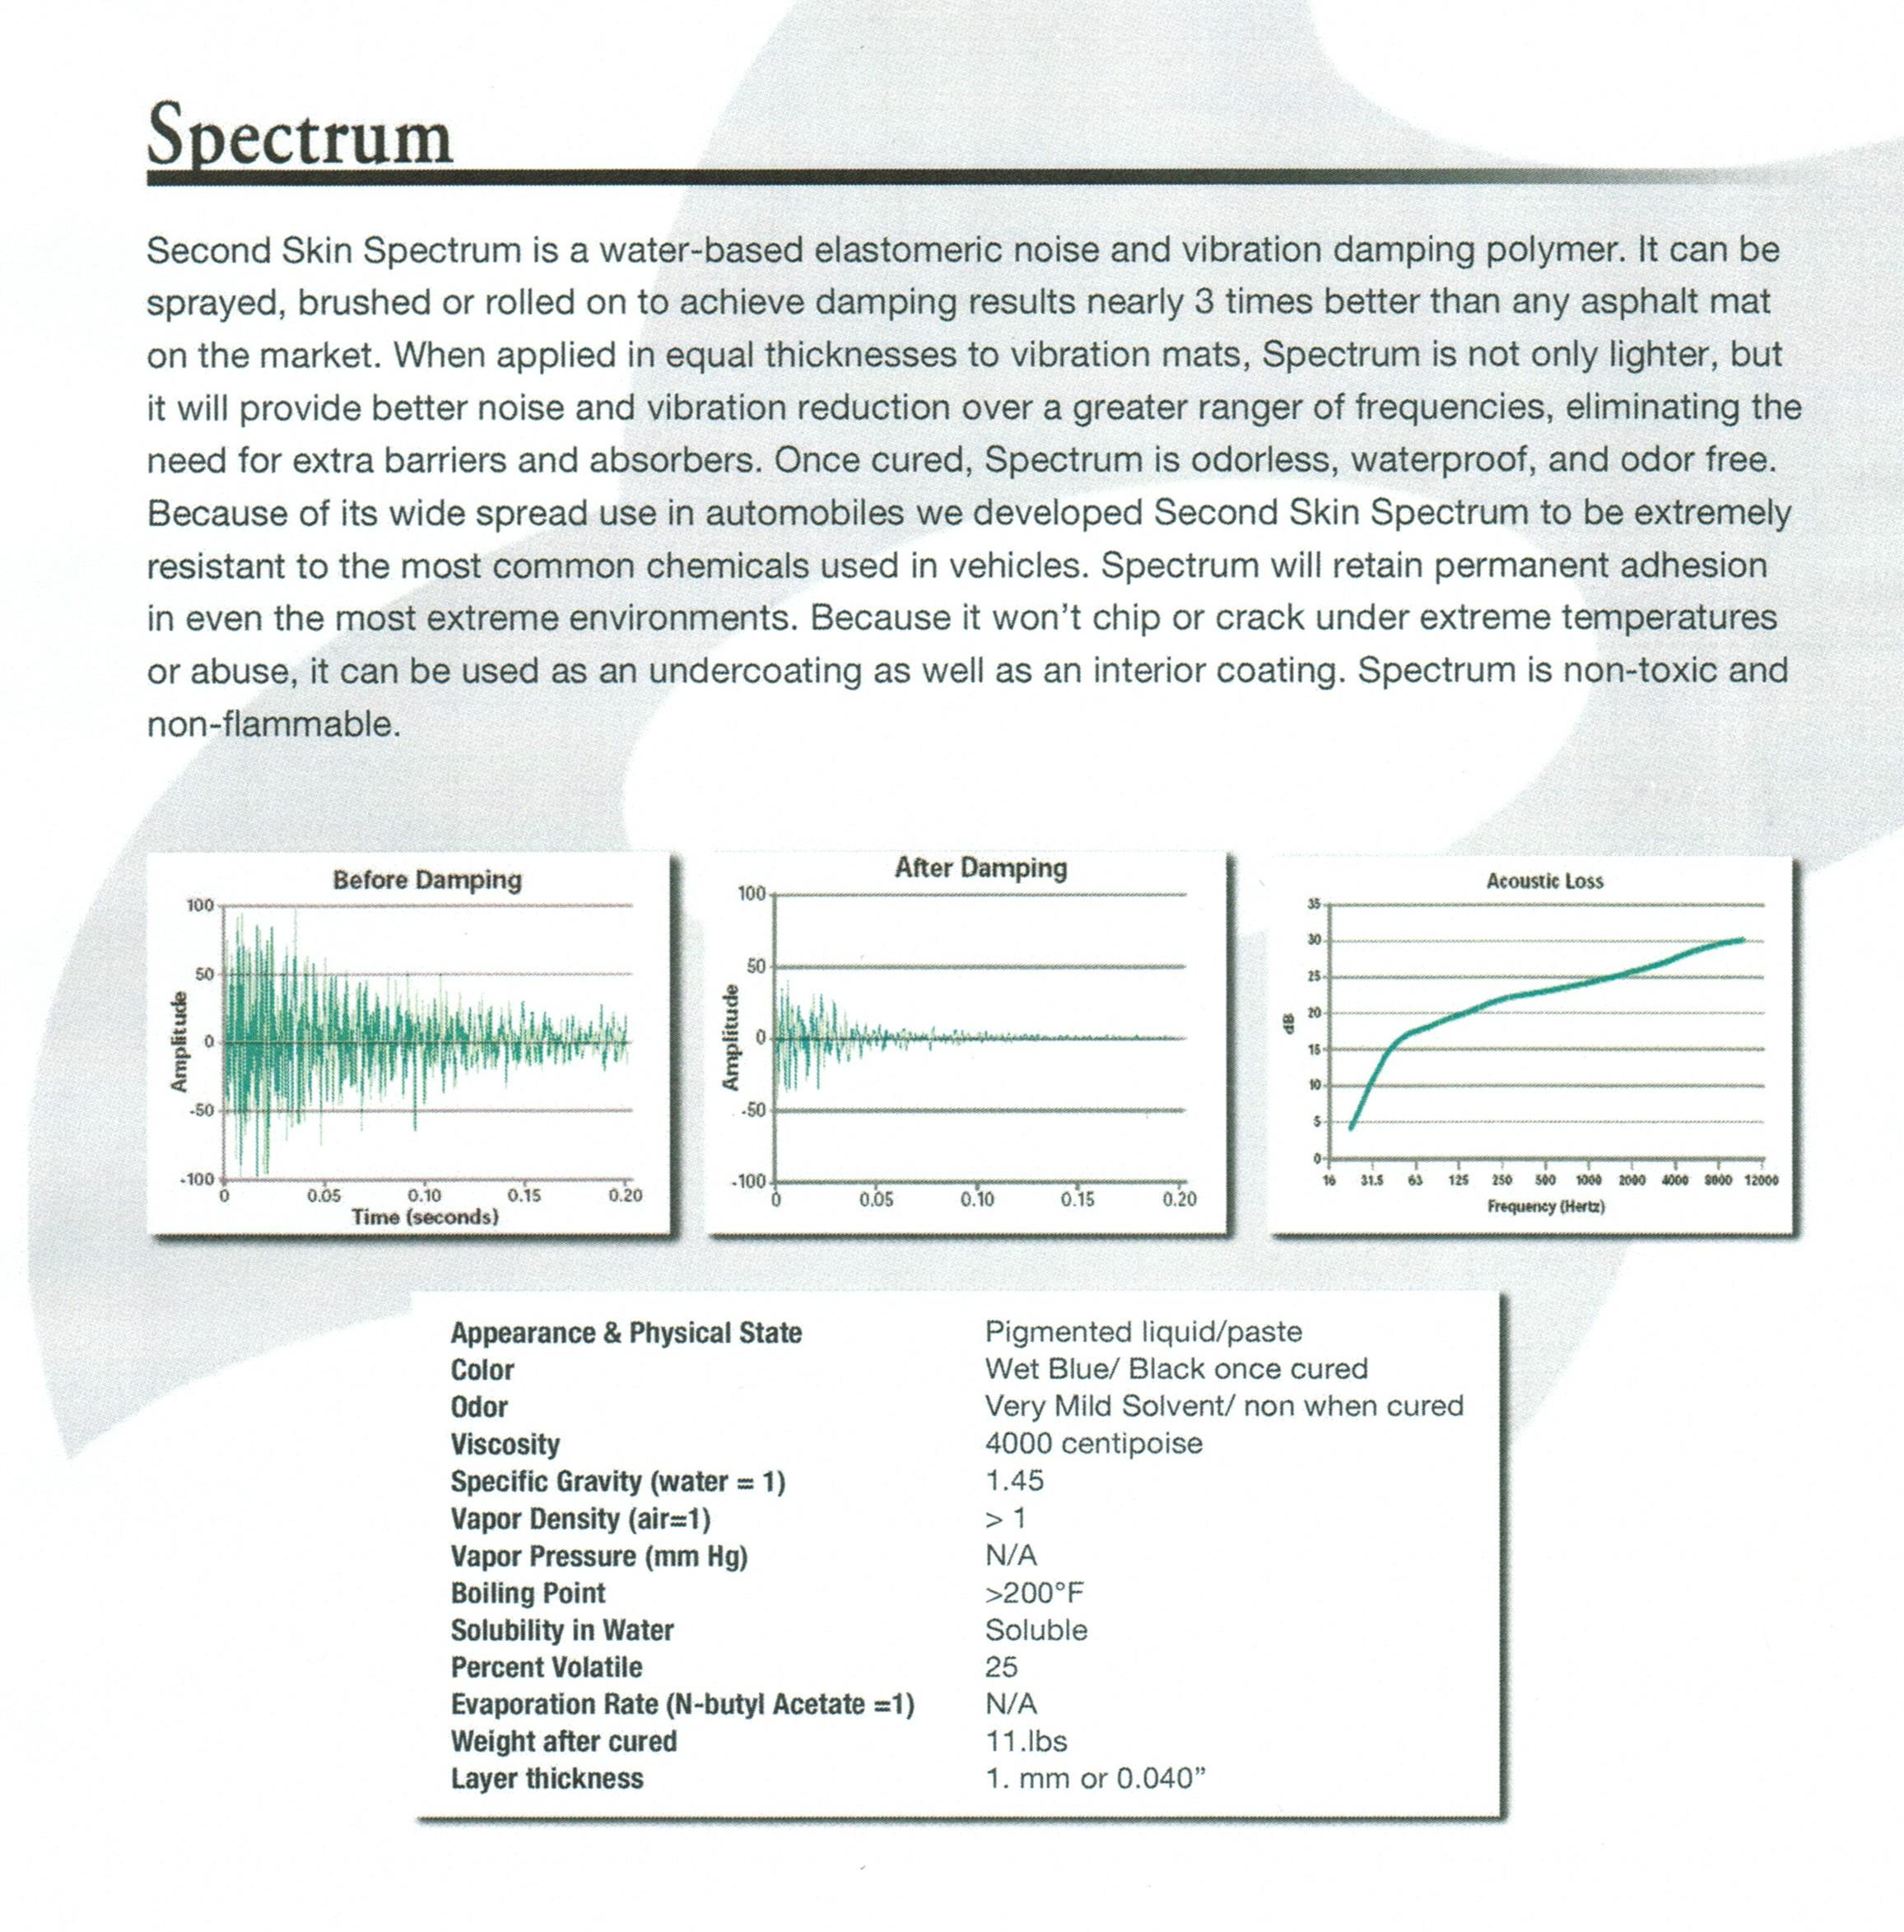 spectrum-specs-cropped.jpg